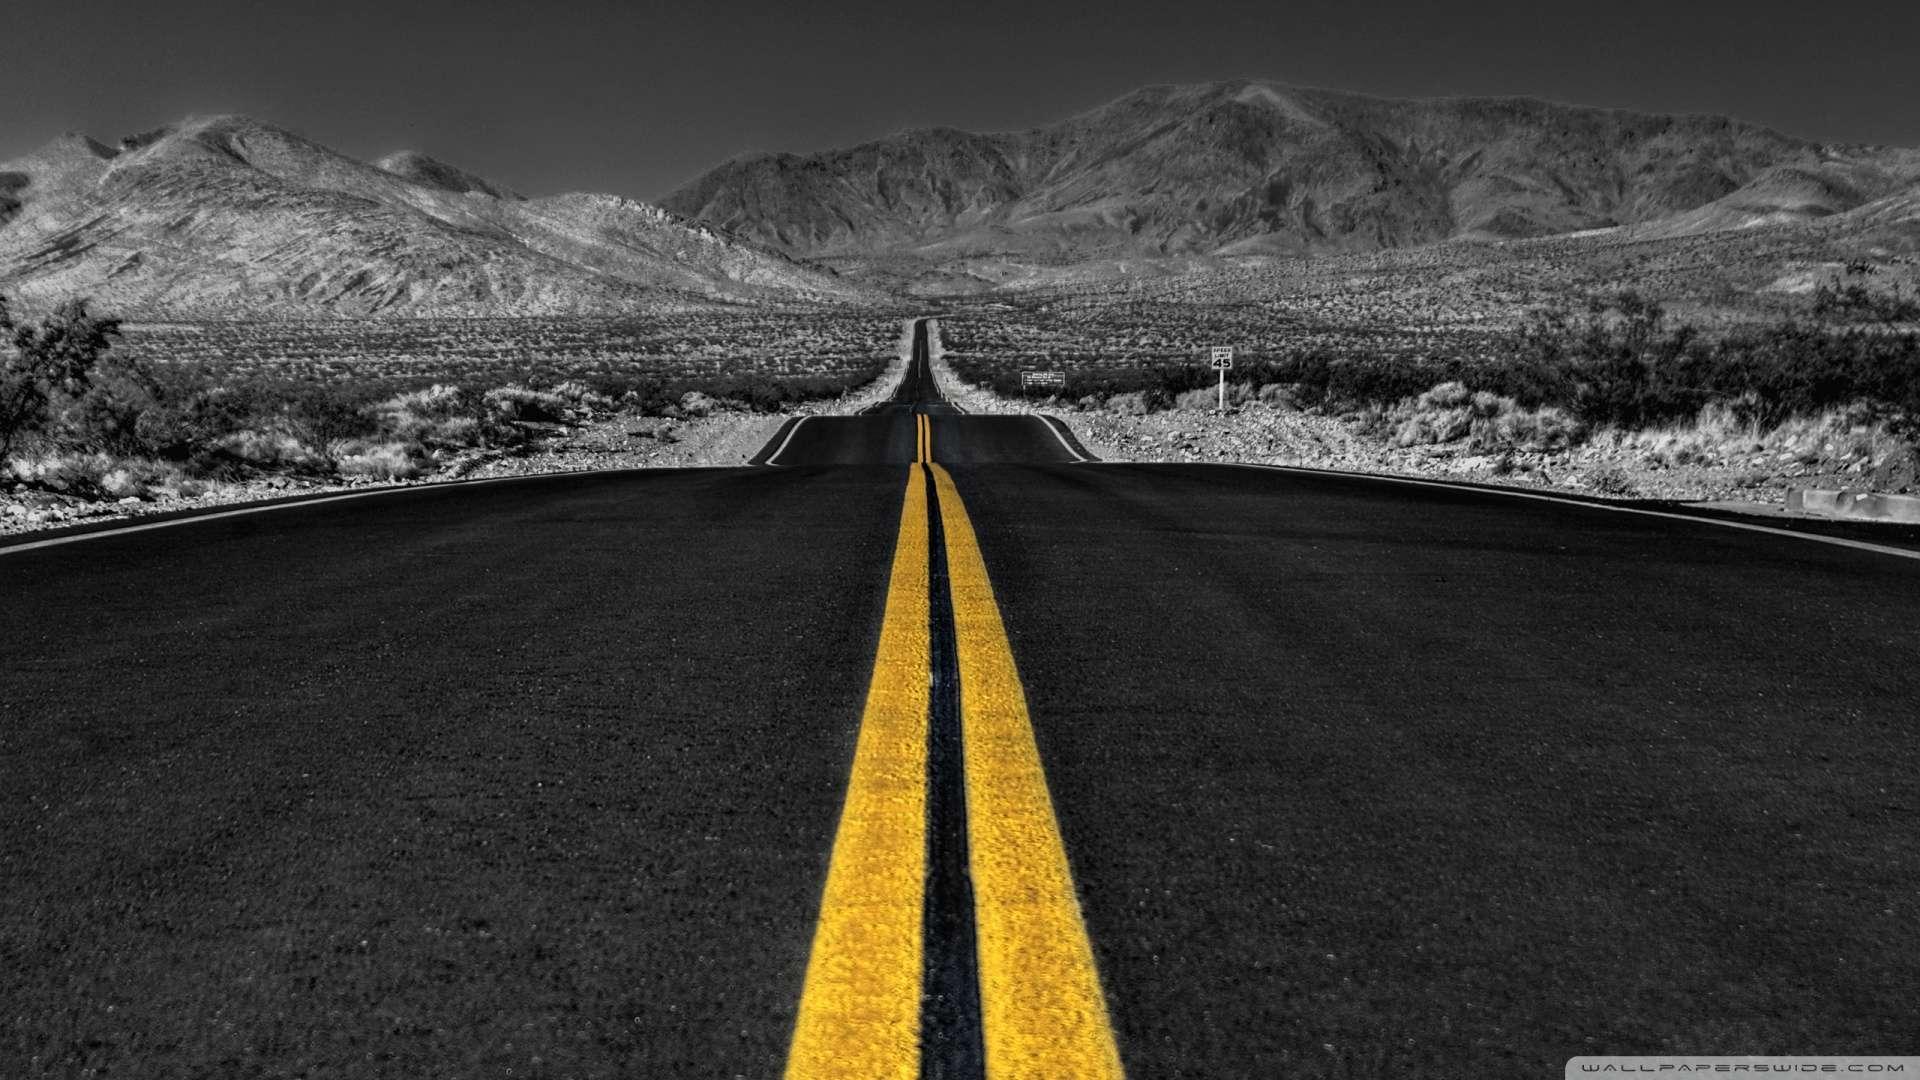 Hd wallpaper 1080p - Wallpaper Long Desert Road Black And White Wallpaper 1080p Hd Upload